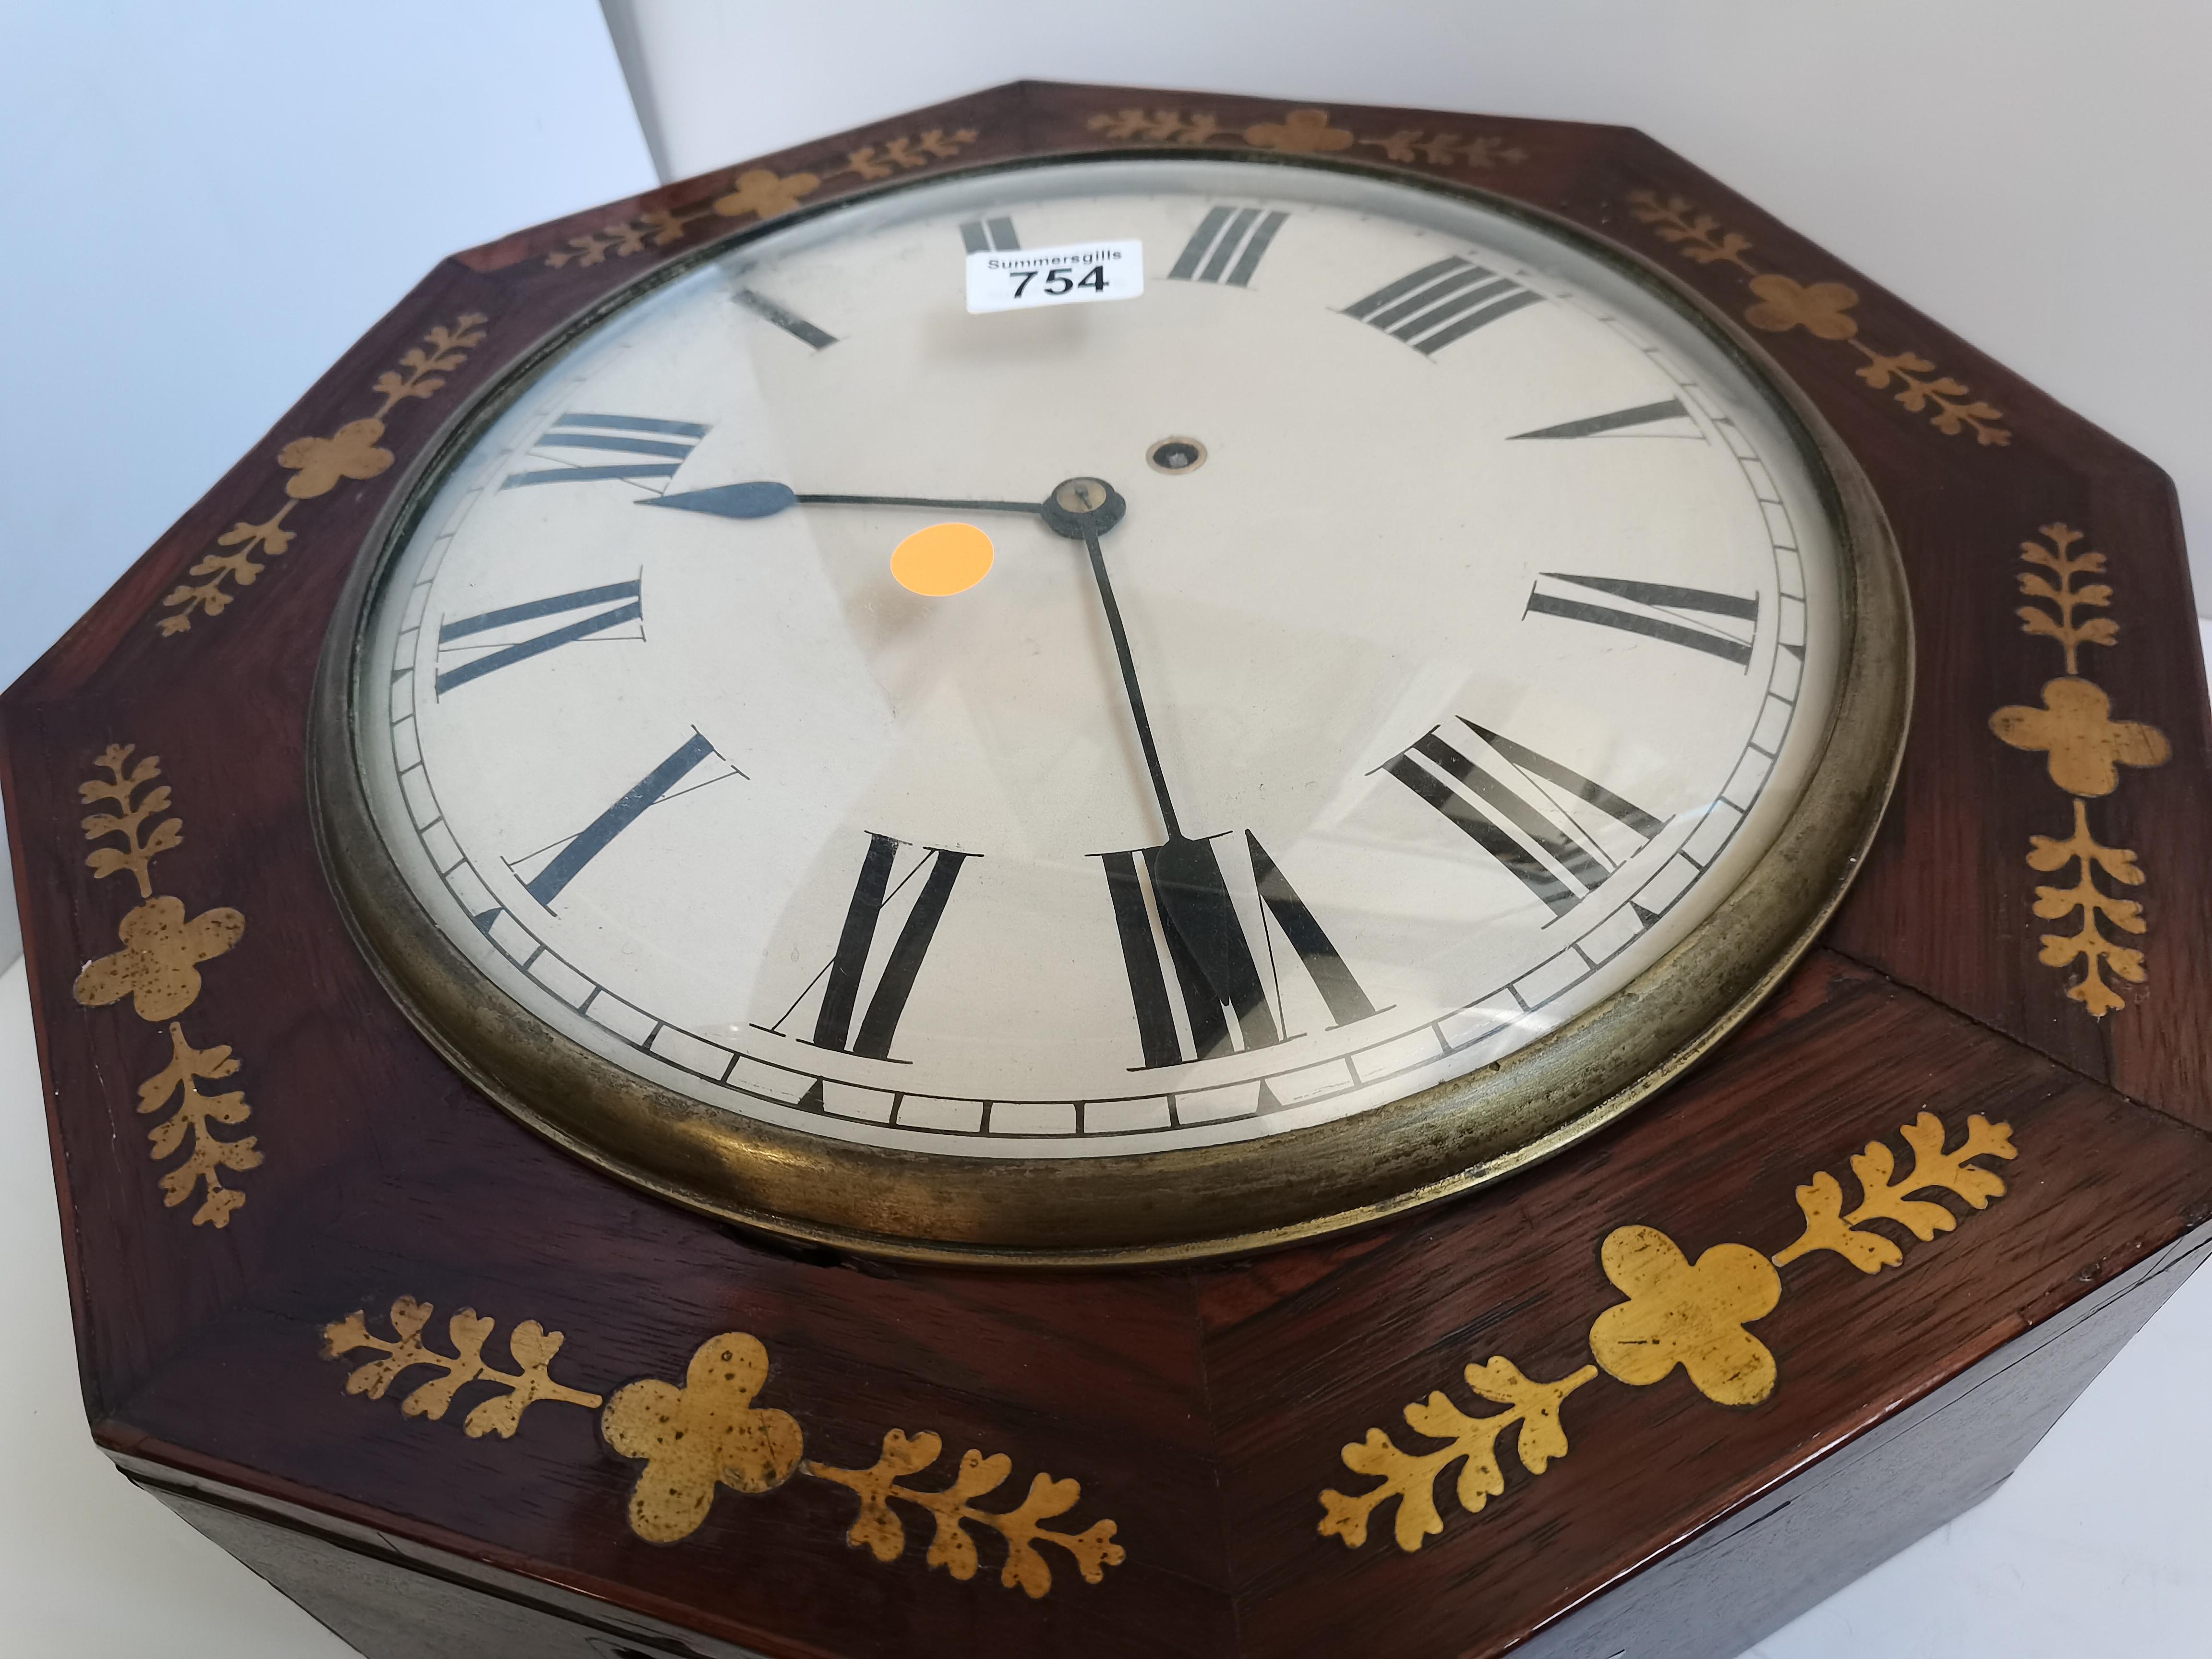 Regency Wall Clock - Image 2 of 6